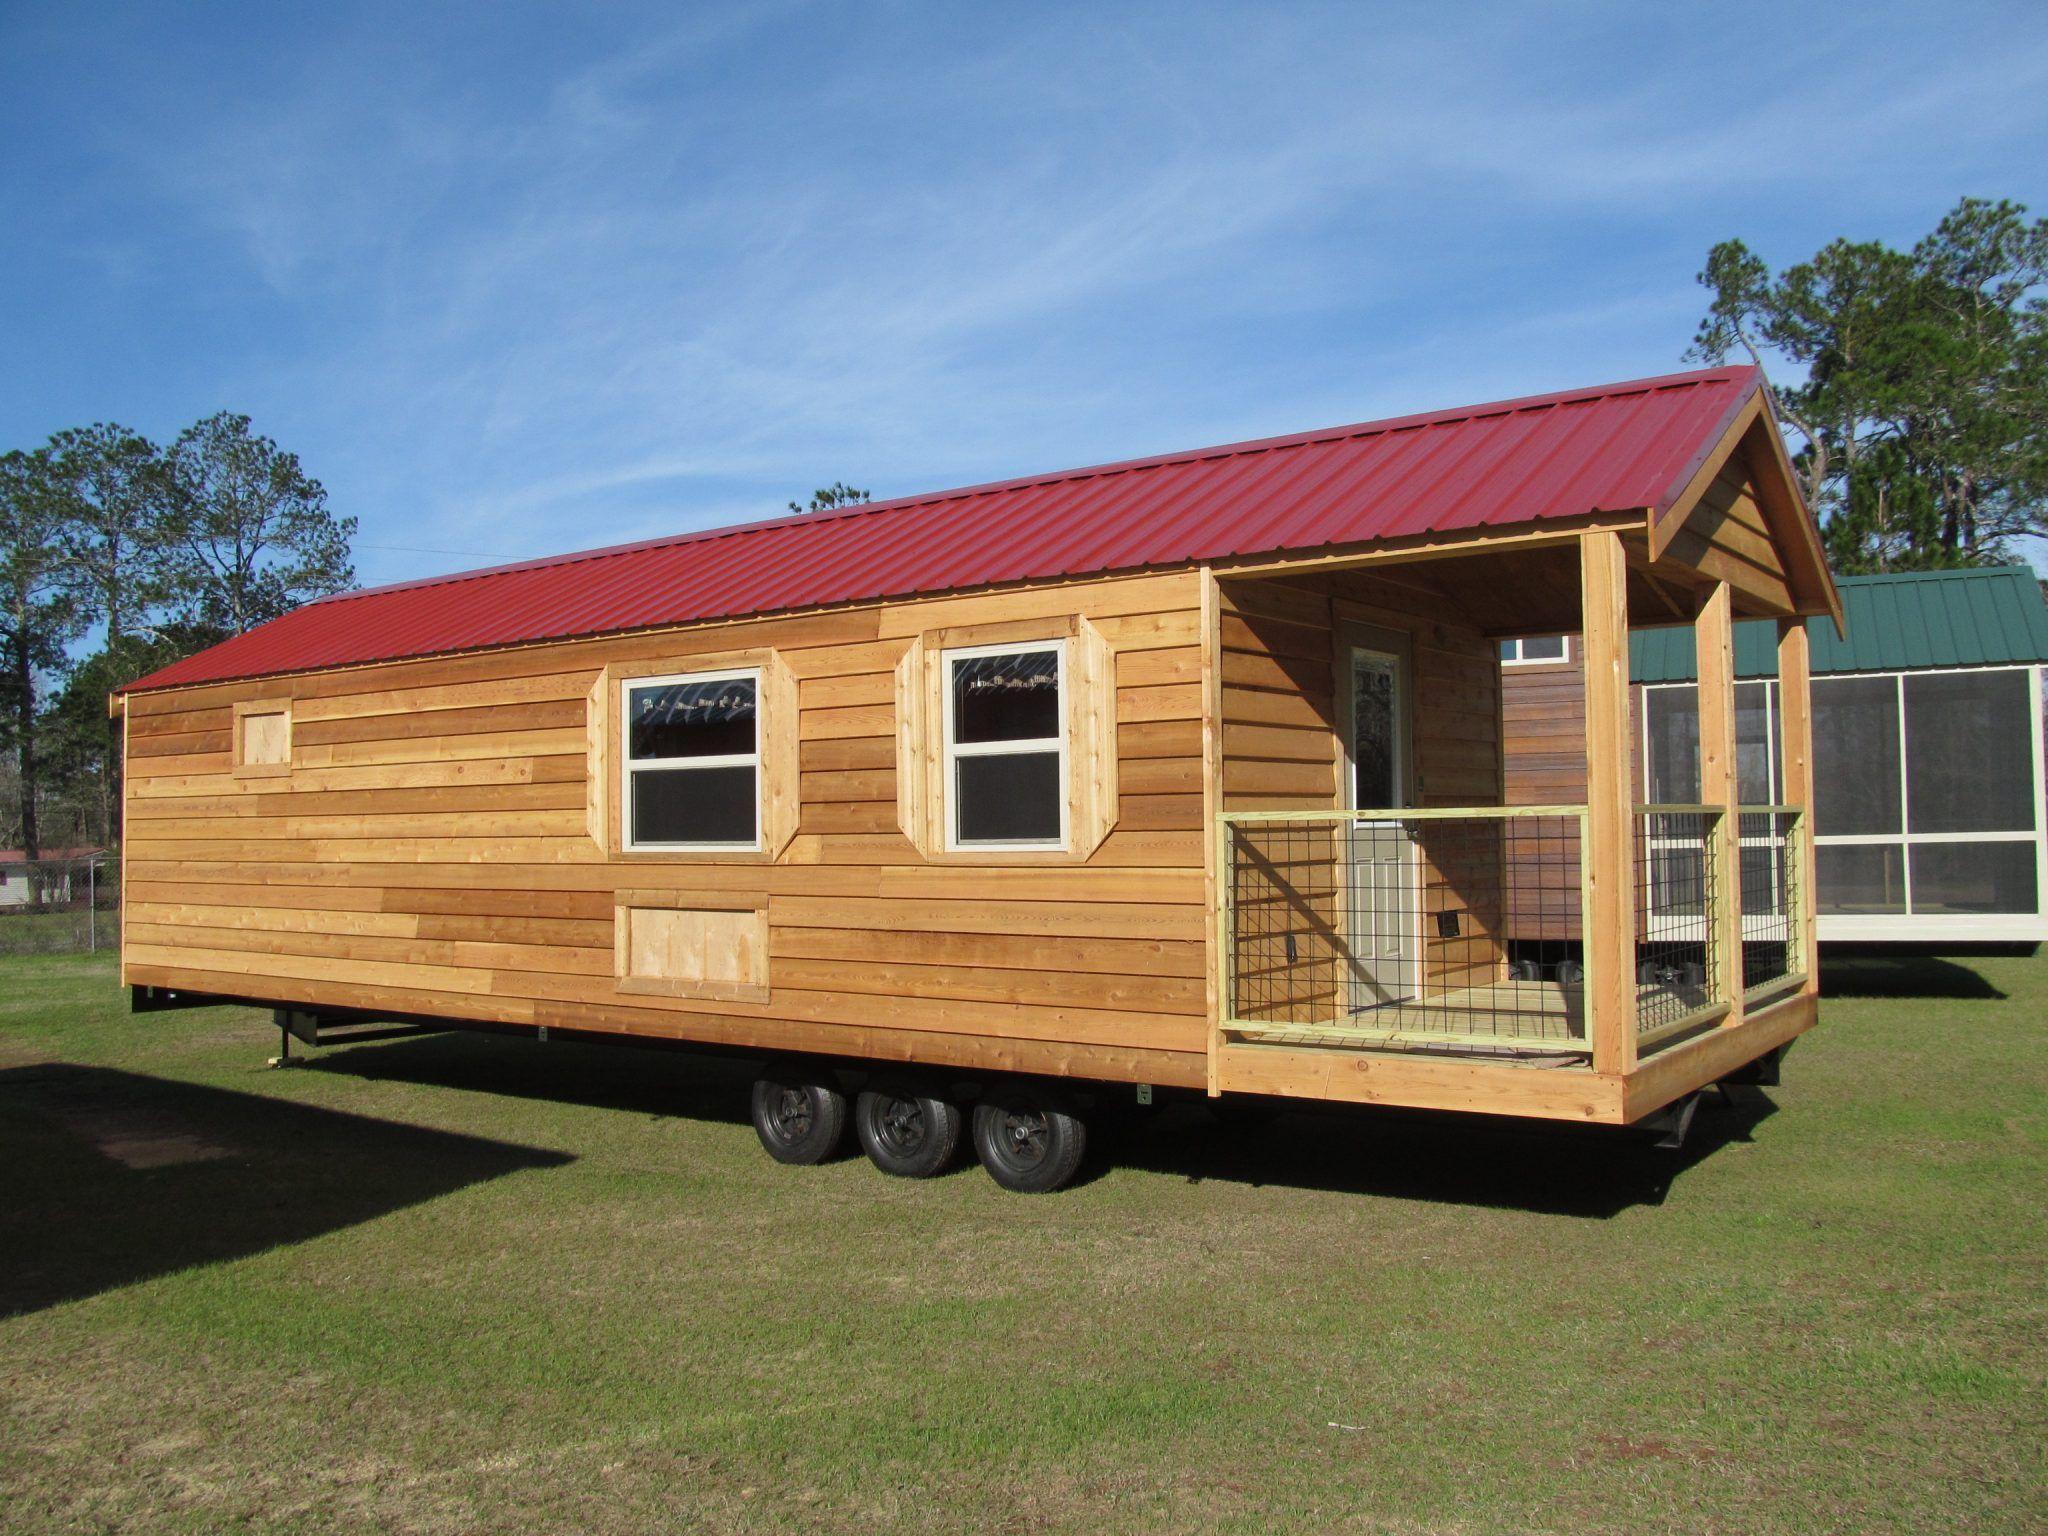 Tiny Cabin Built By Pinnacle Park Homes | Tiny House | Cedar cabin on mobile home park requirements, mobile home rentals, mobile home parks in california,